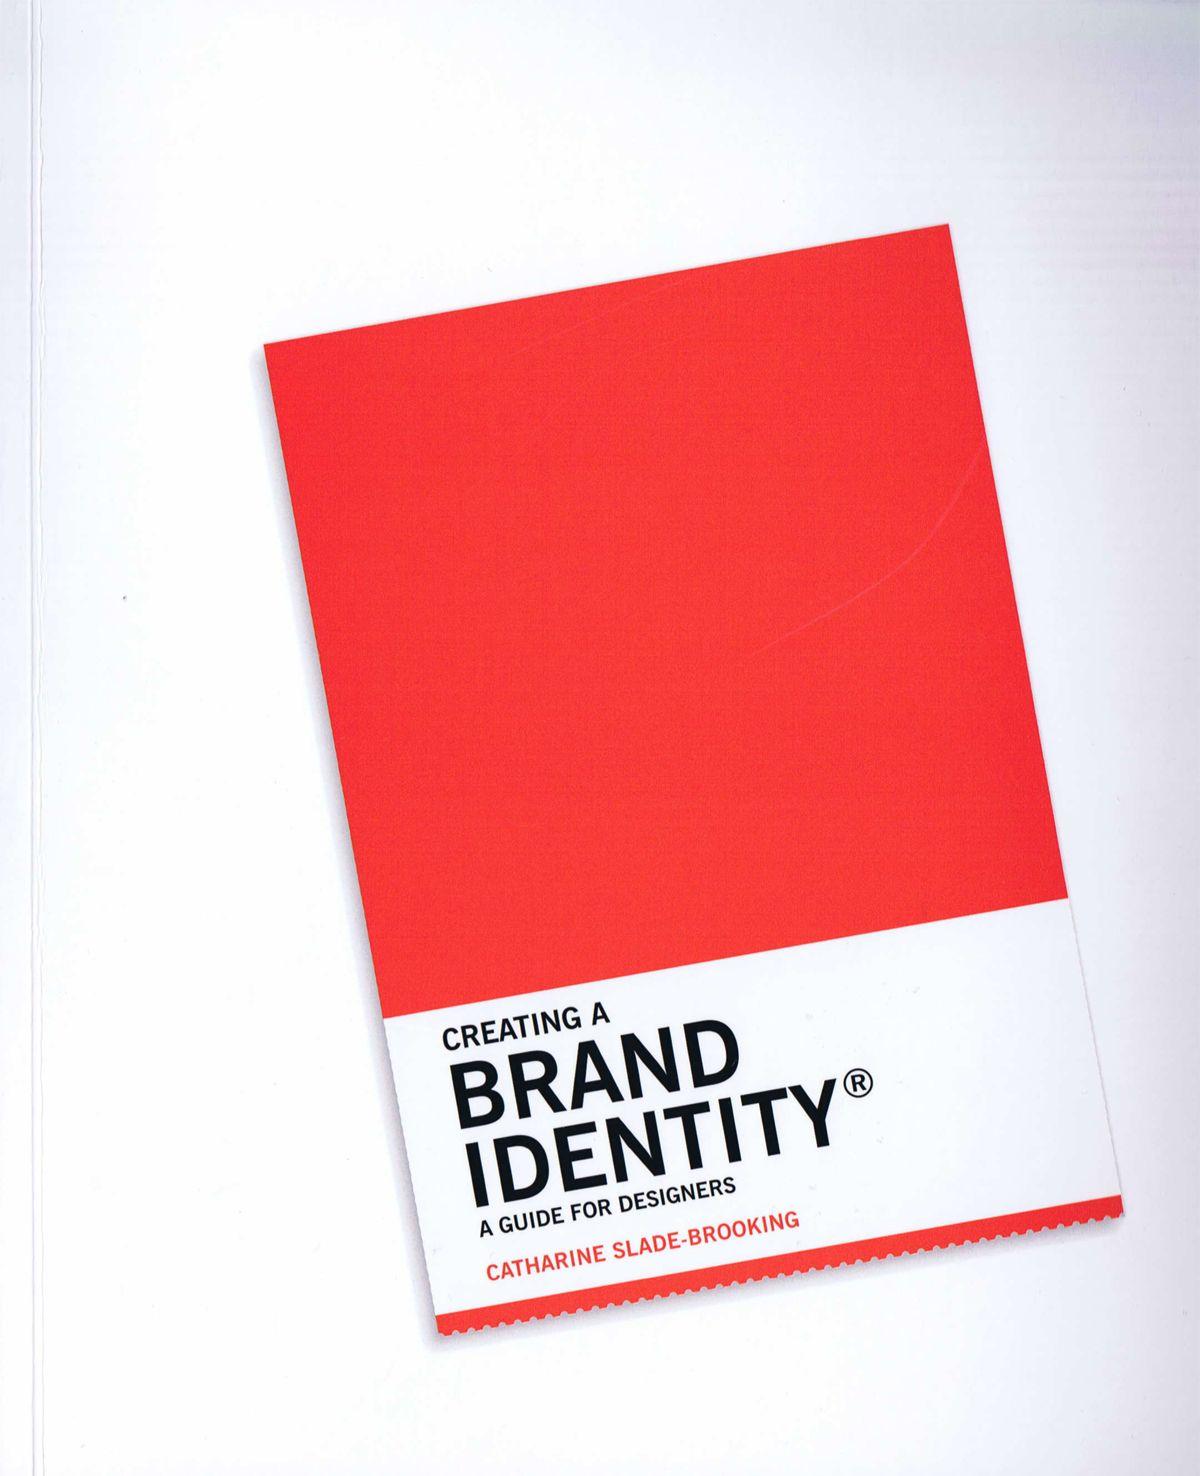 Creating a Brand Identity: A Guide for Designers bog fra Viking og Creas